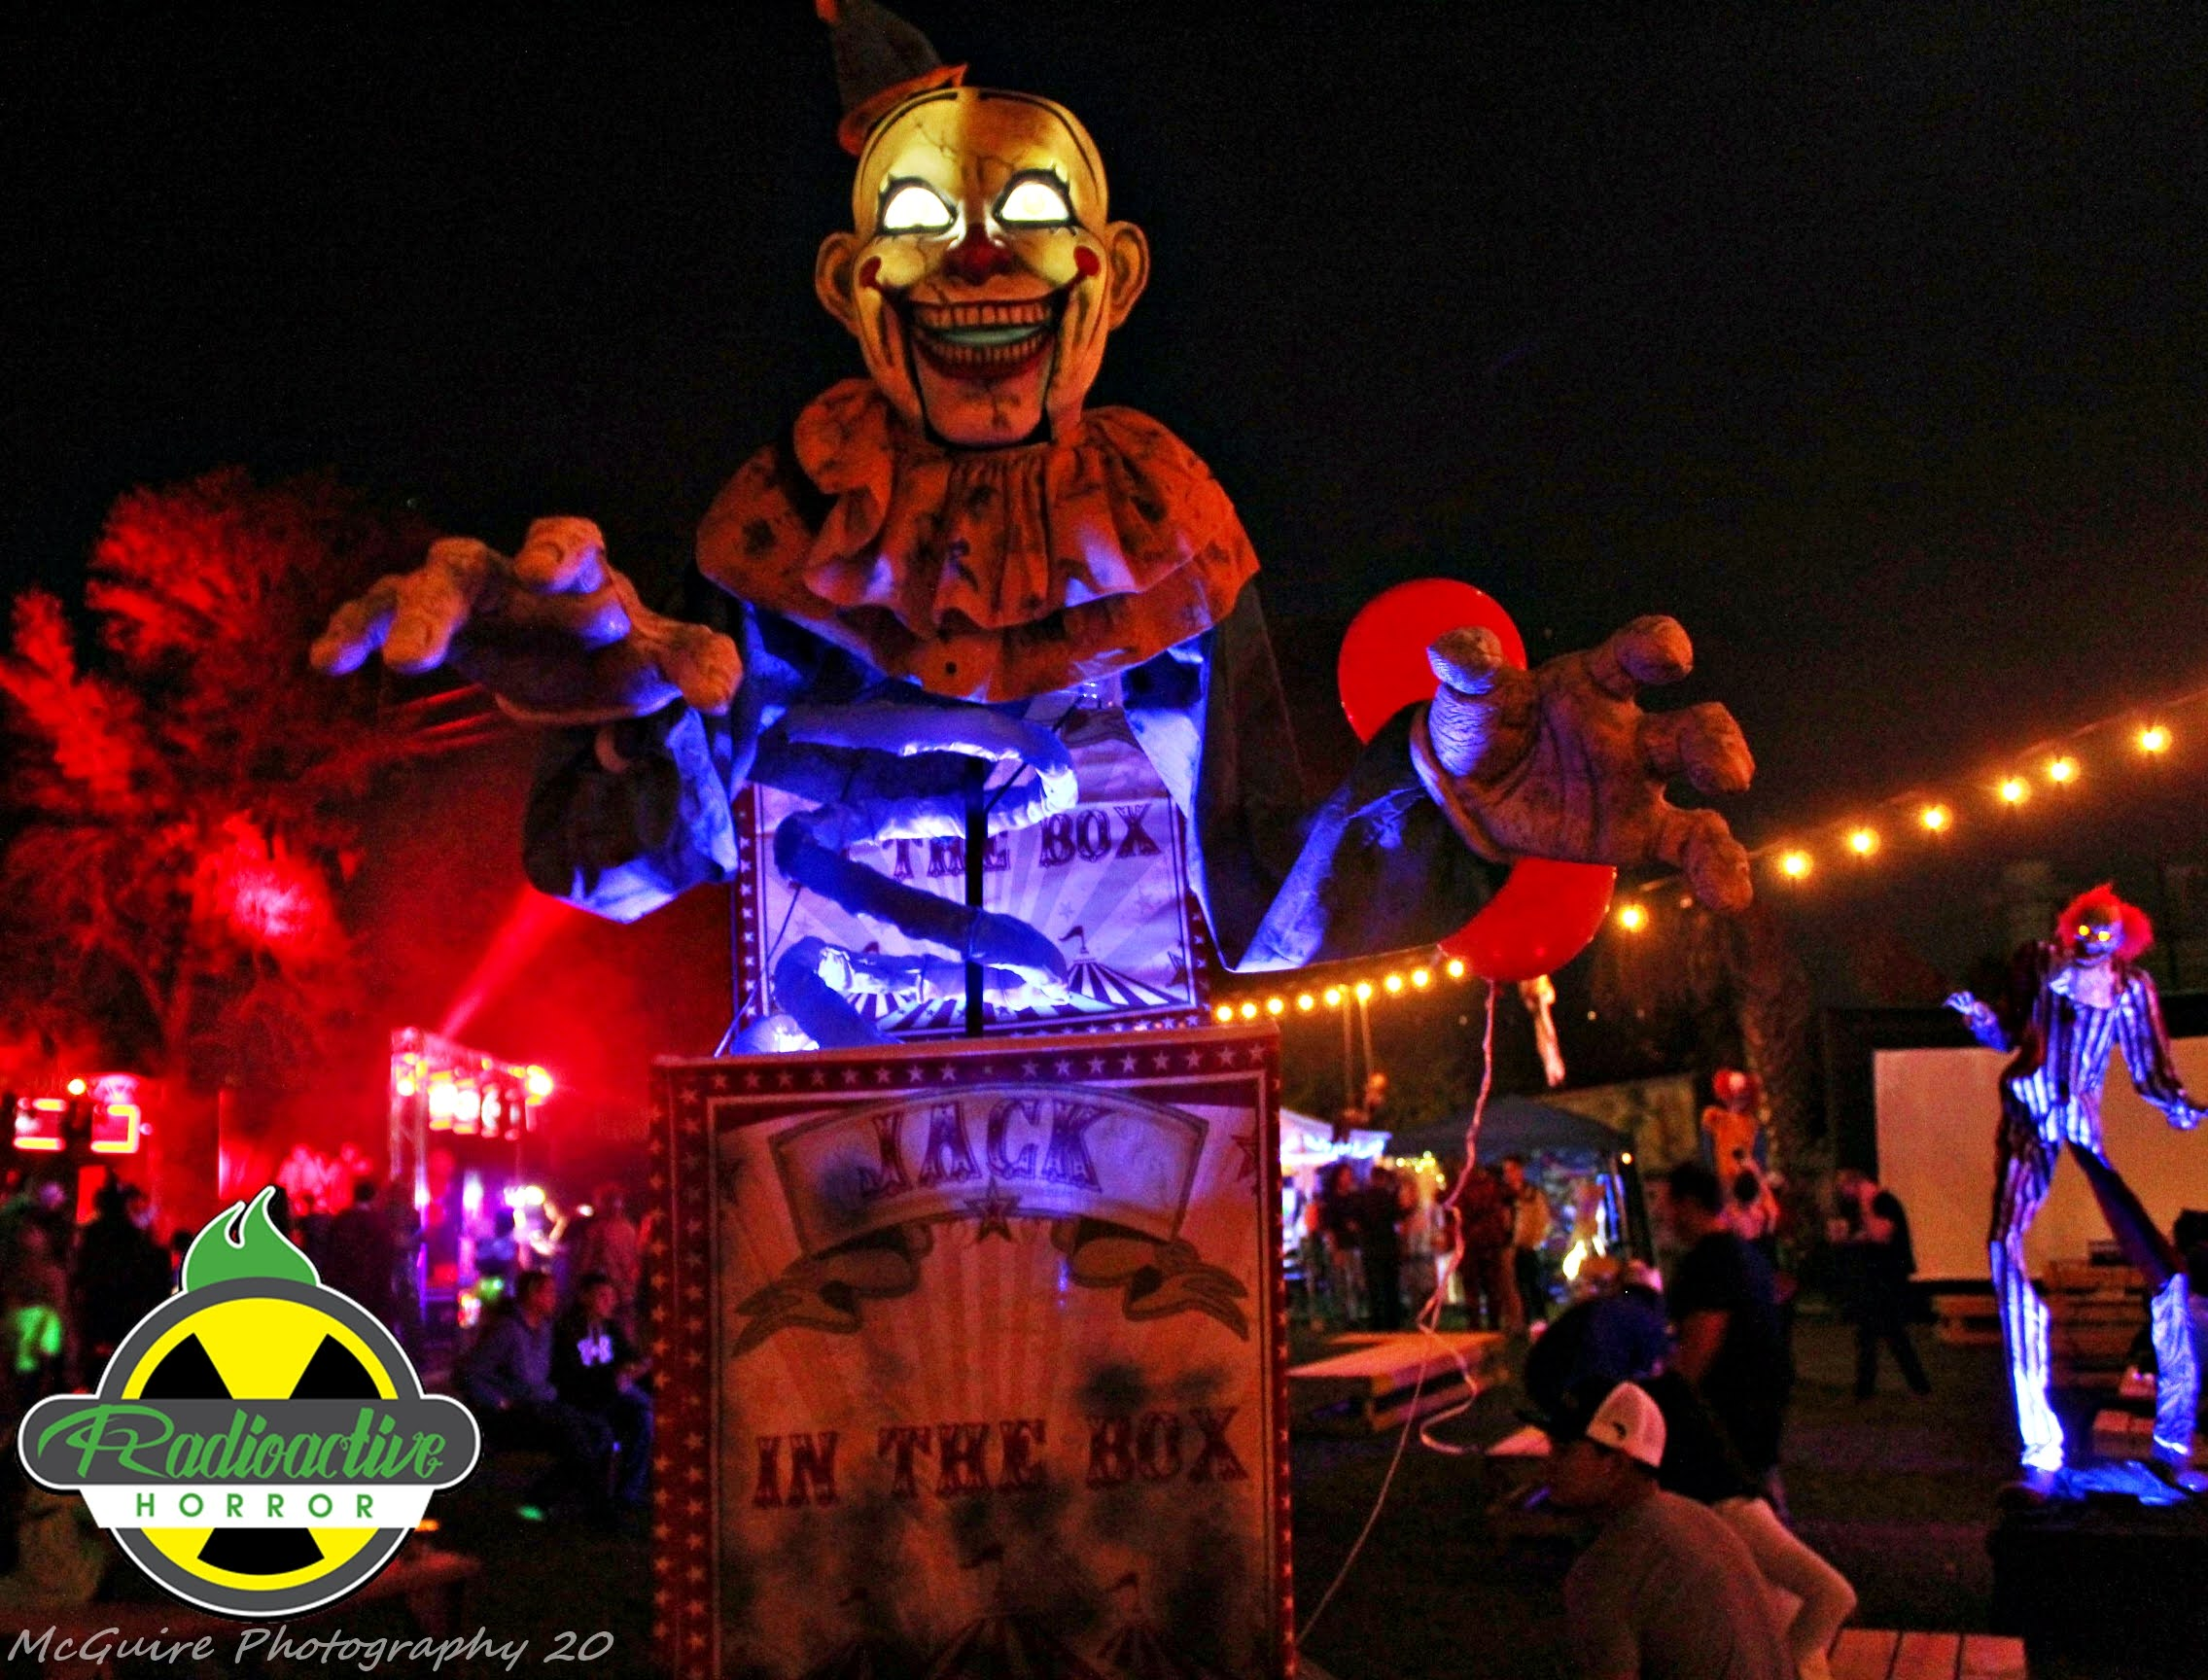 Radioactive circus 7 2020